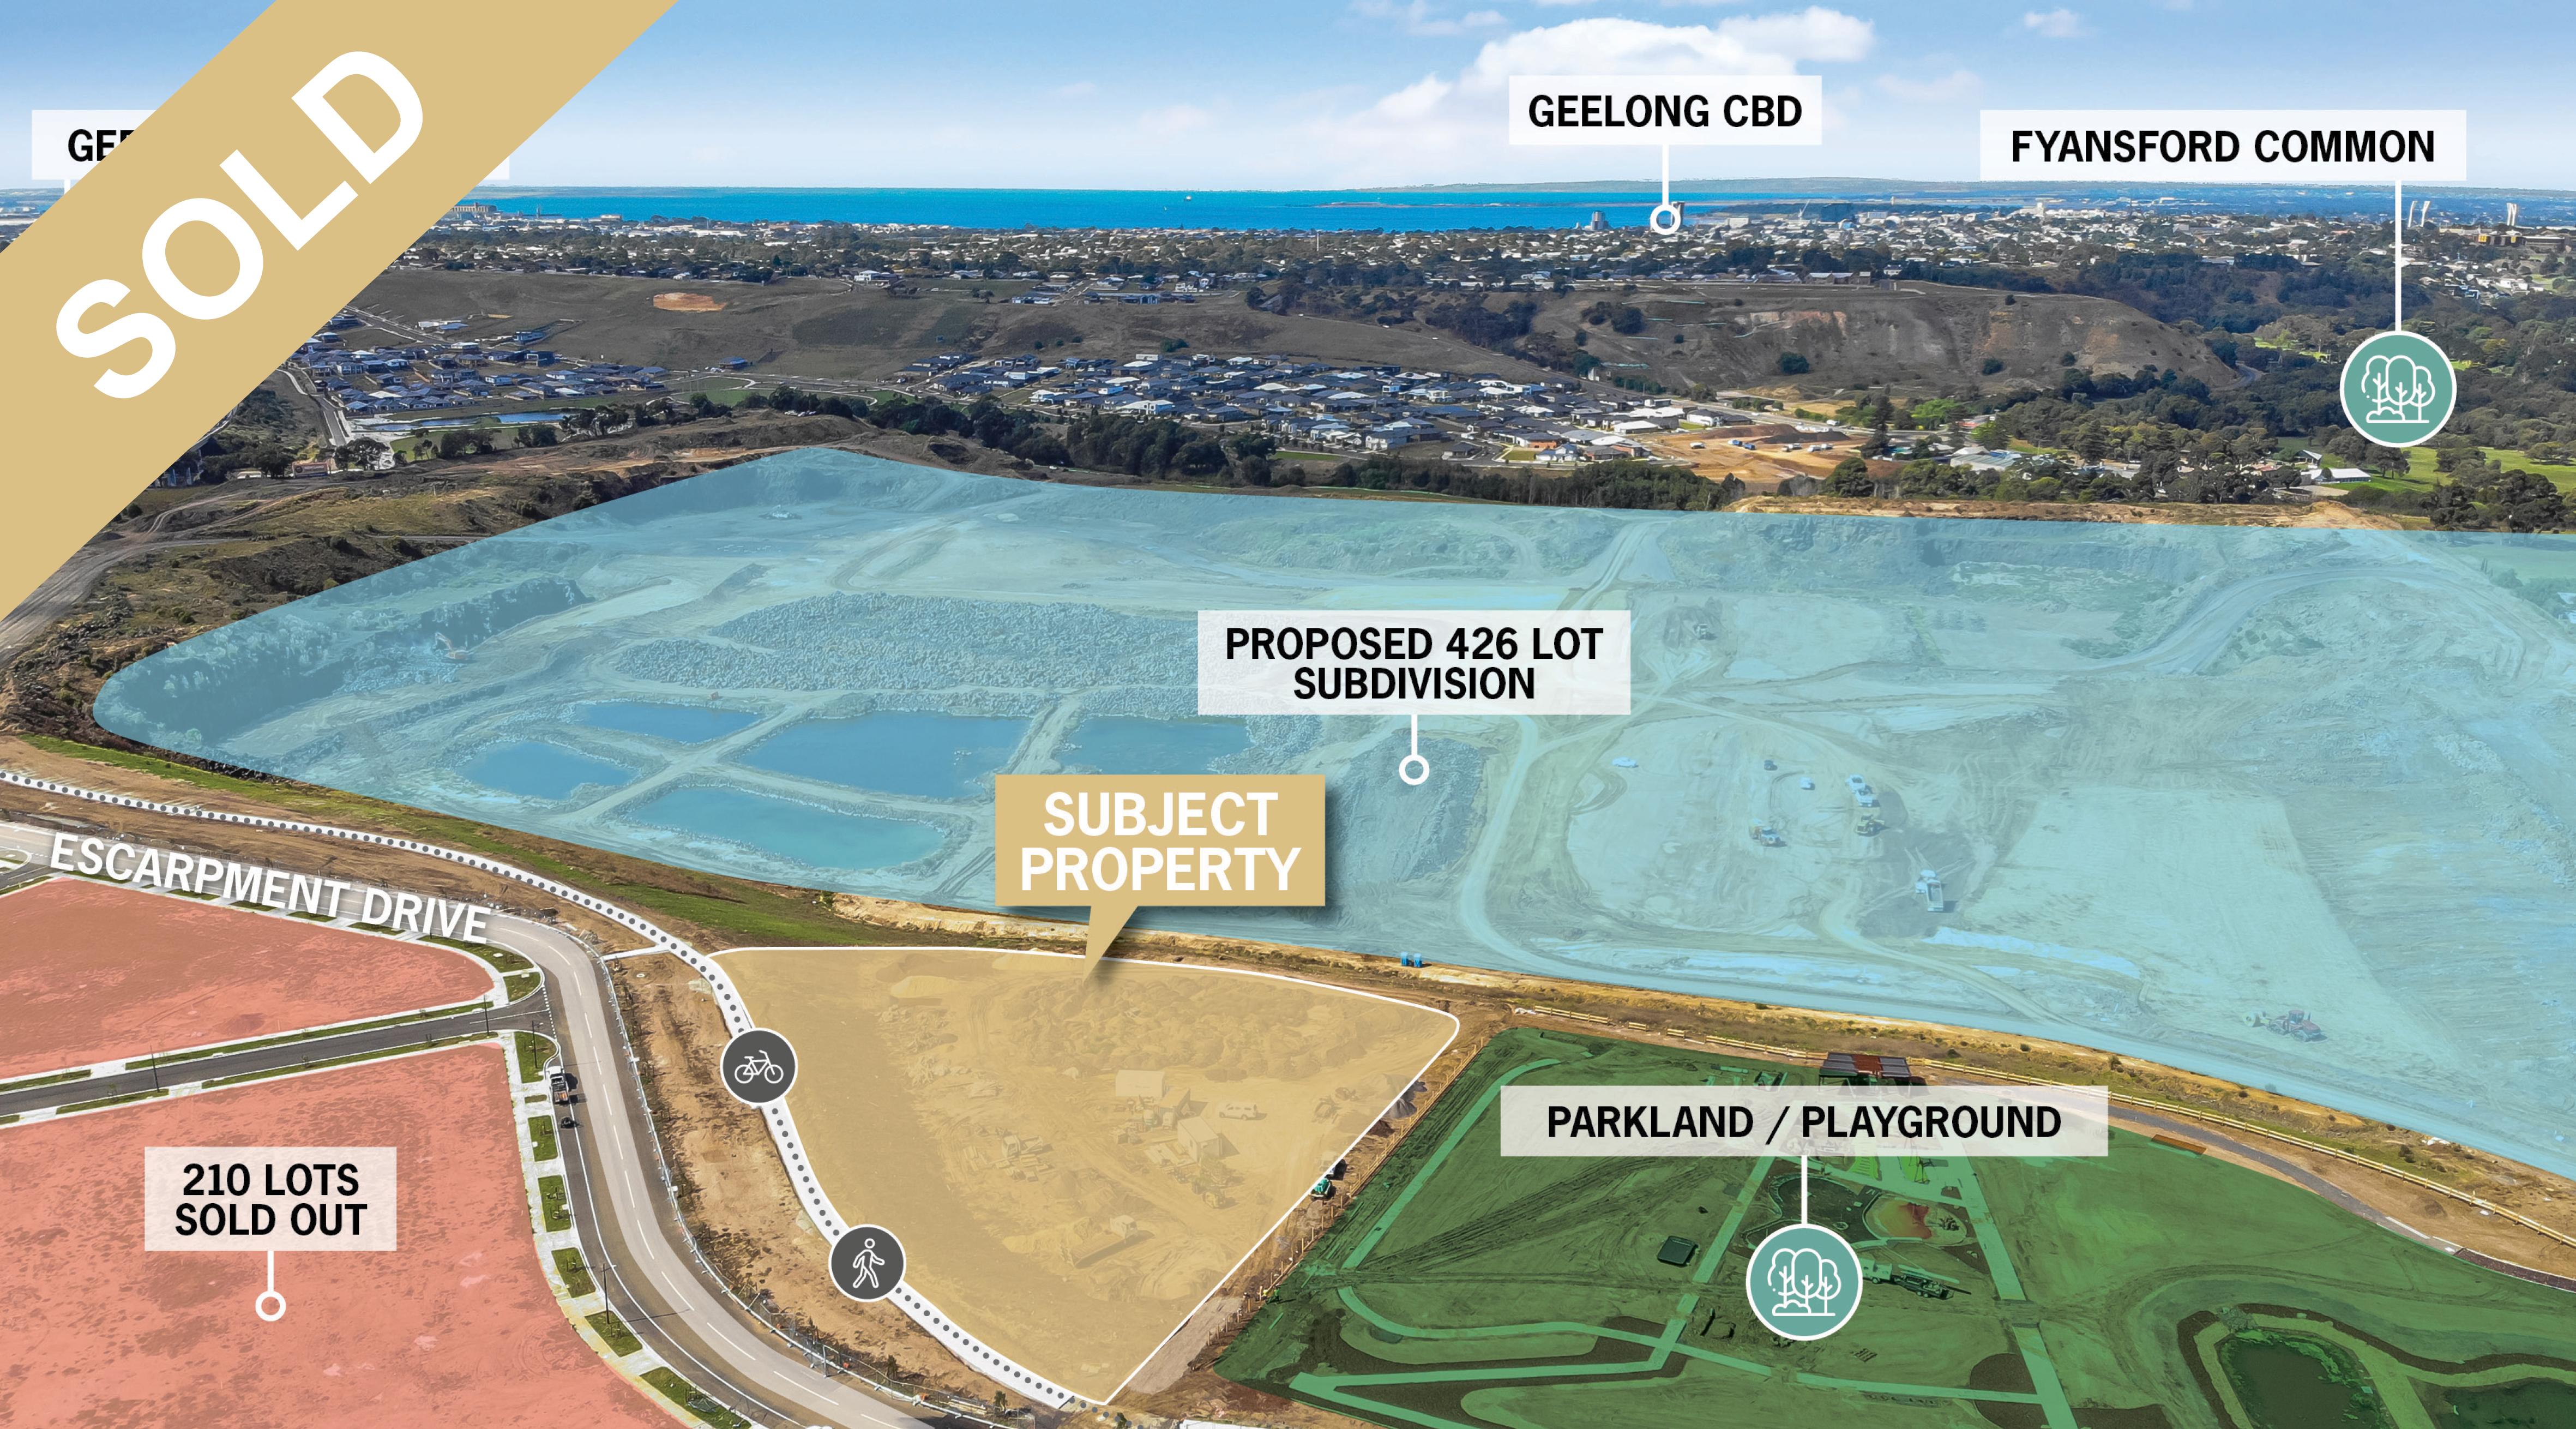 Melbourne Based Developer Secures Proposed Geelong Townhouse Development Site